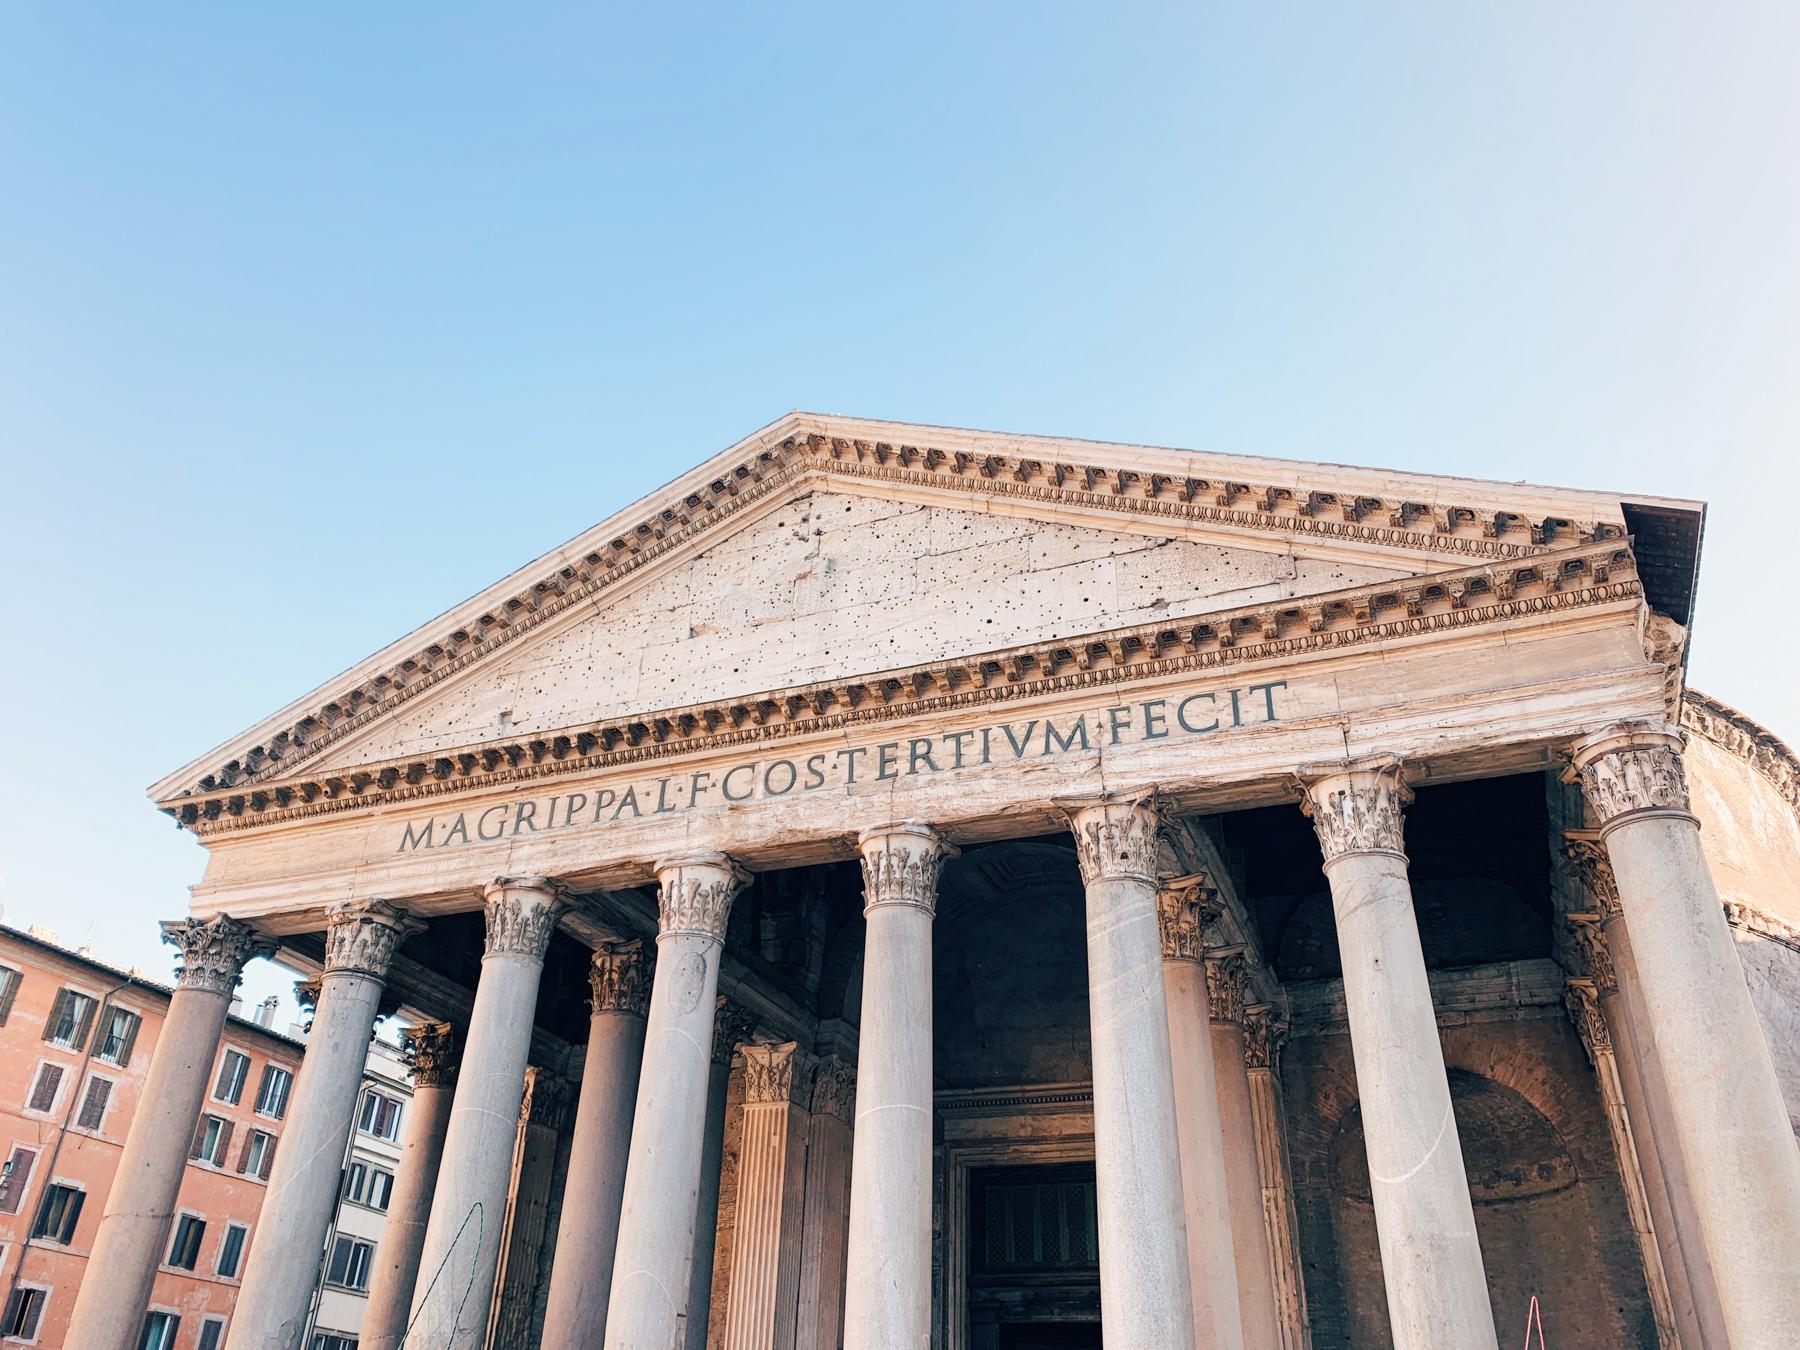 The Pantheon!